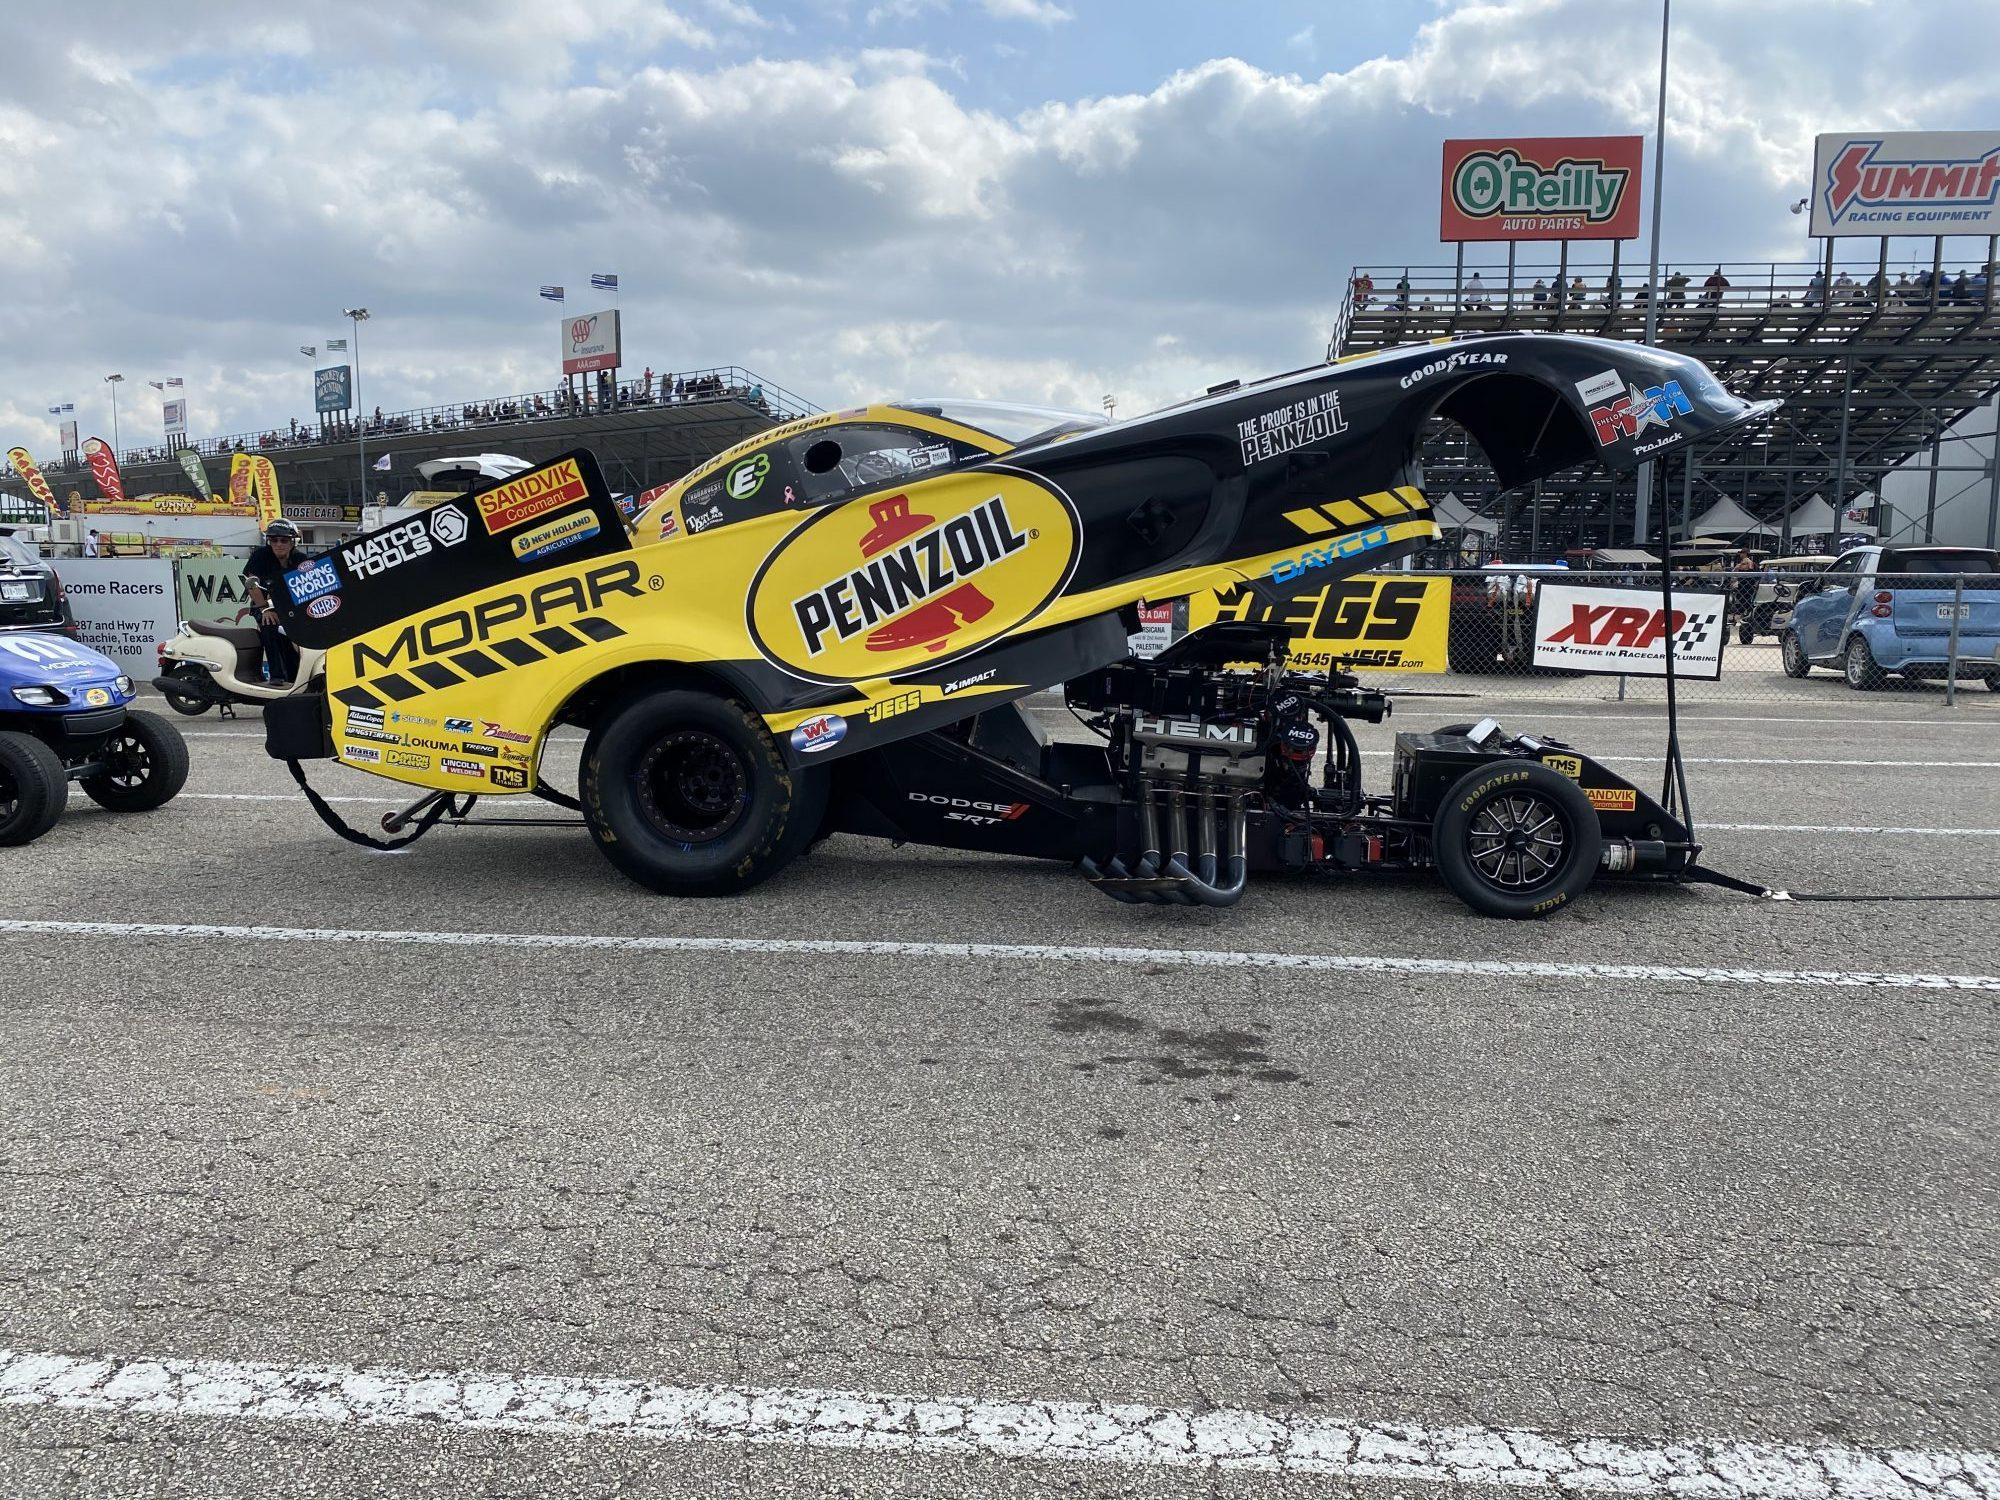 Matt Hagan's car waiting to race